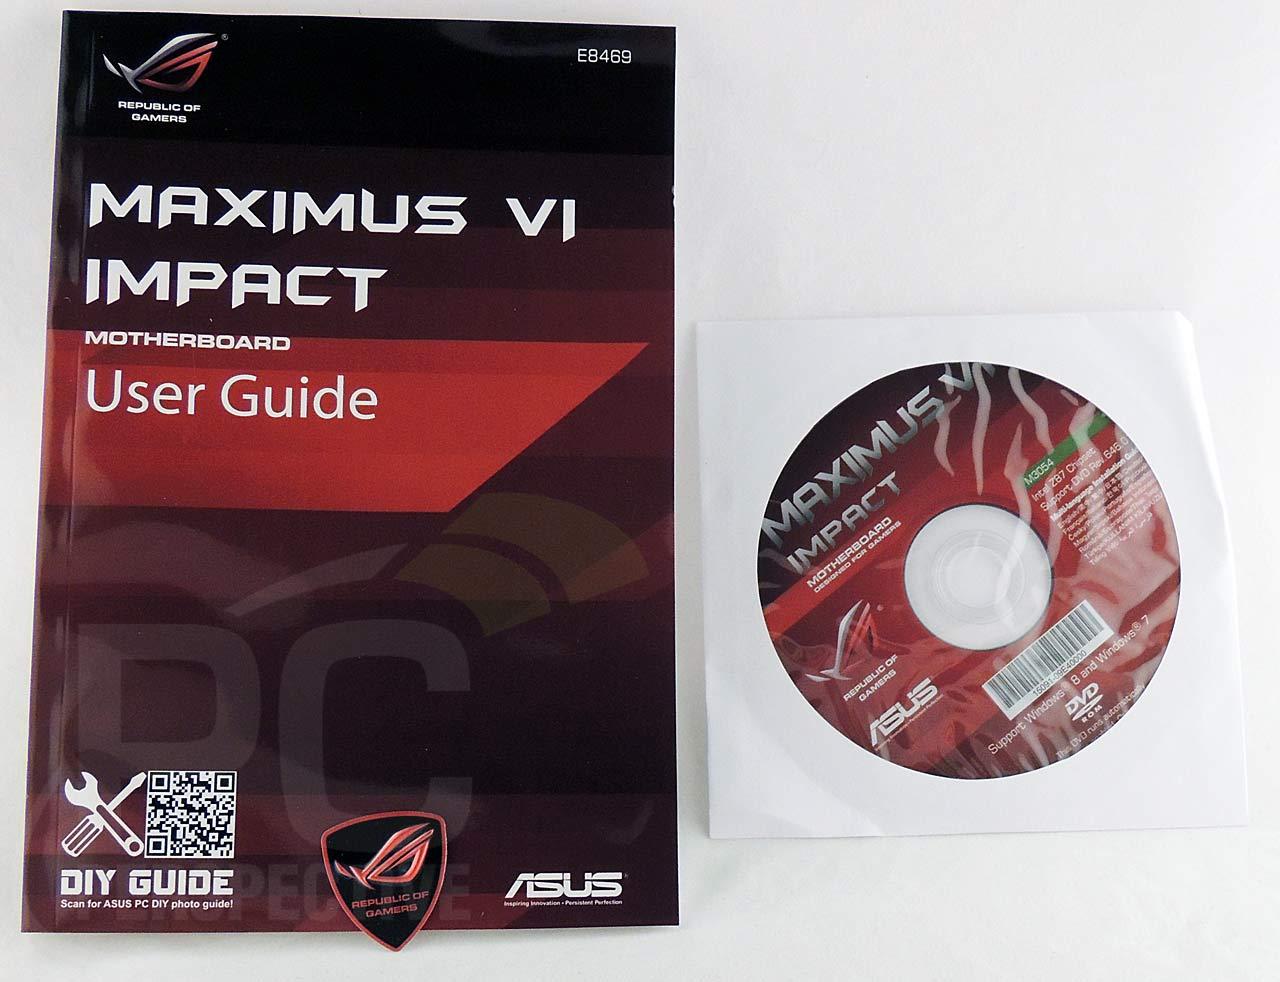 11-manuals-dvd.jpg